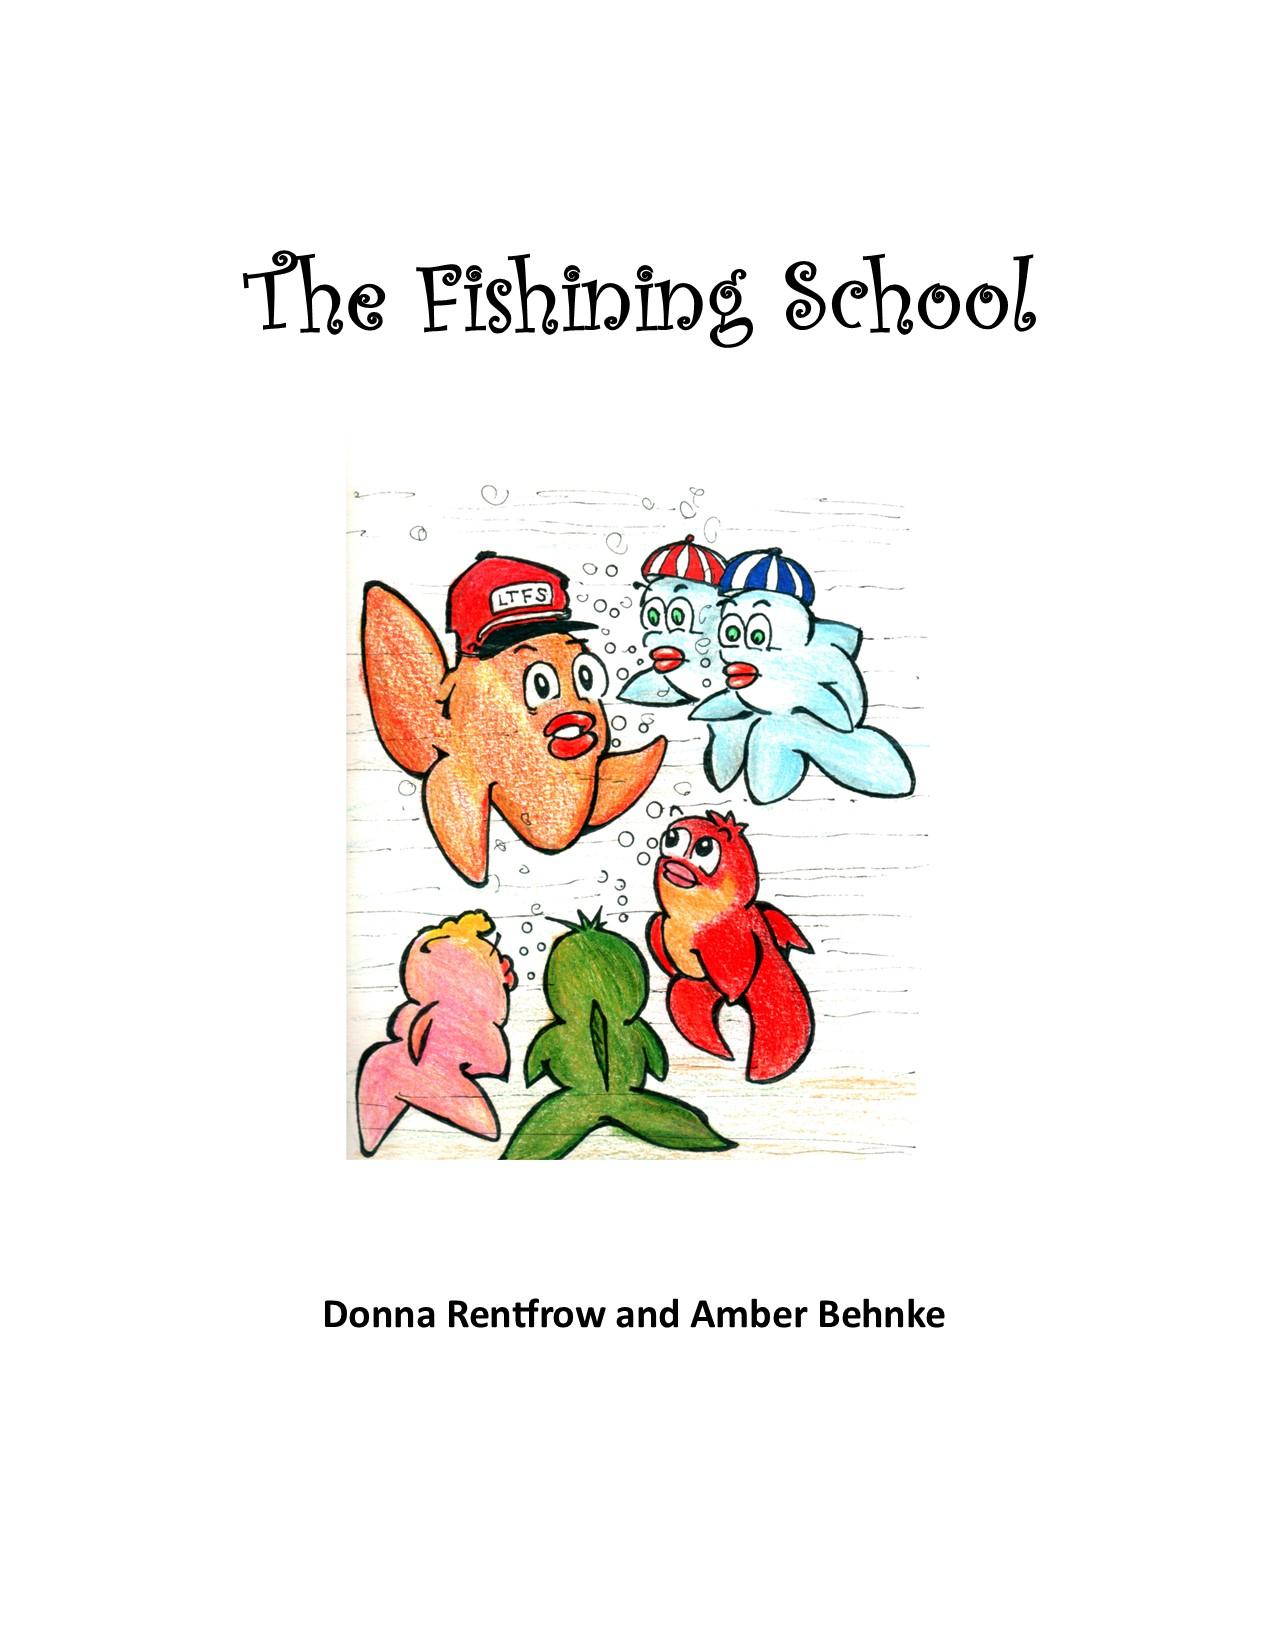 The Fishining School's Ebook Image